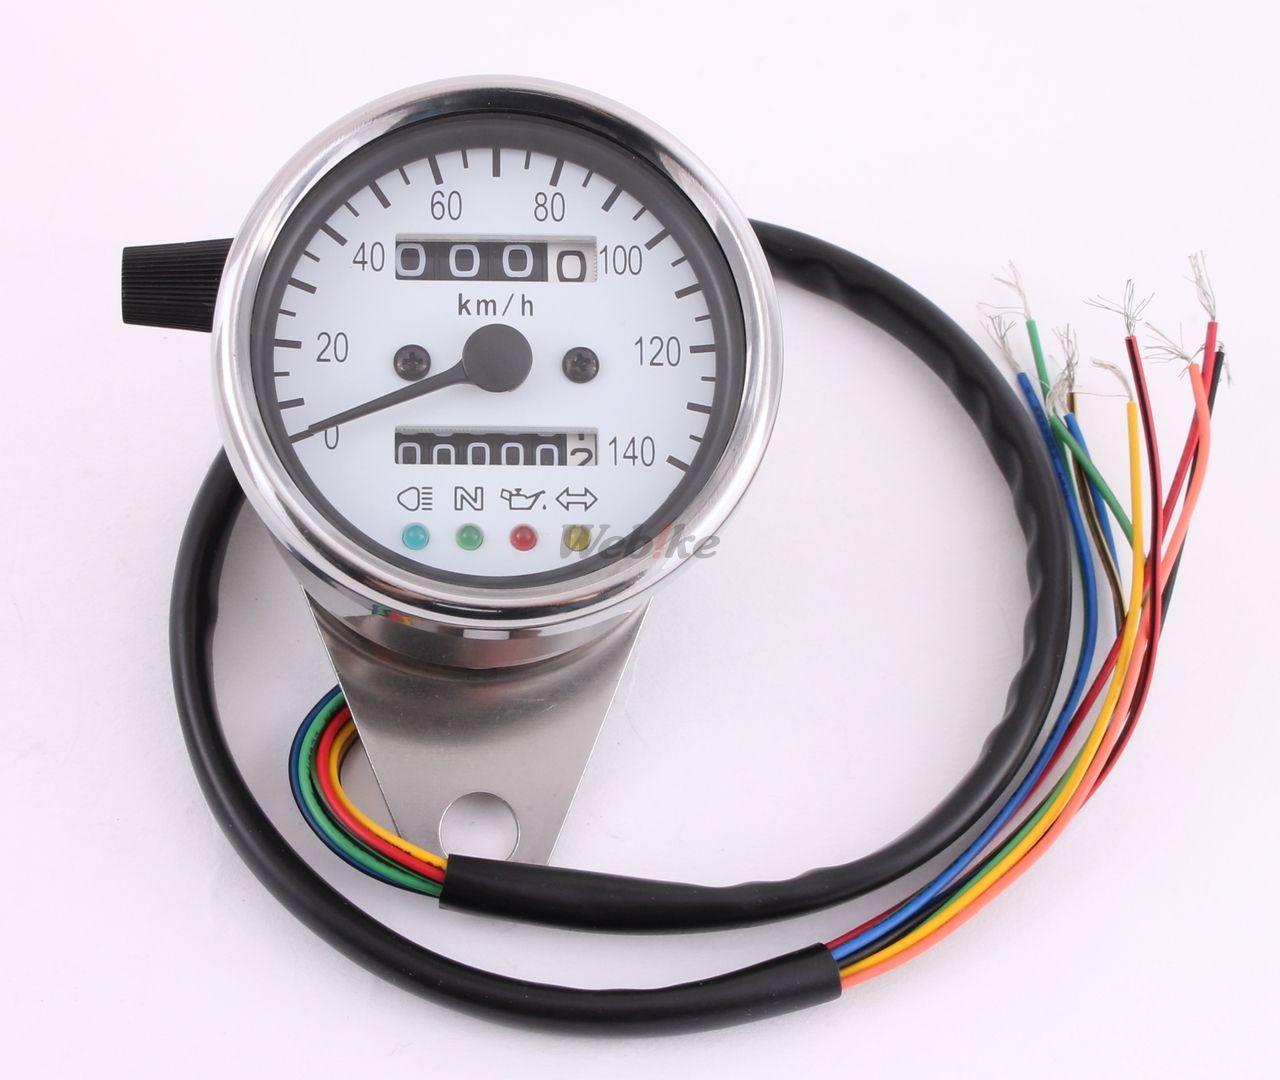 Minimoto Speedometer 140km H 60 Pie White 0996 Gauge Wiring Diagram Page 1 Of 2